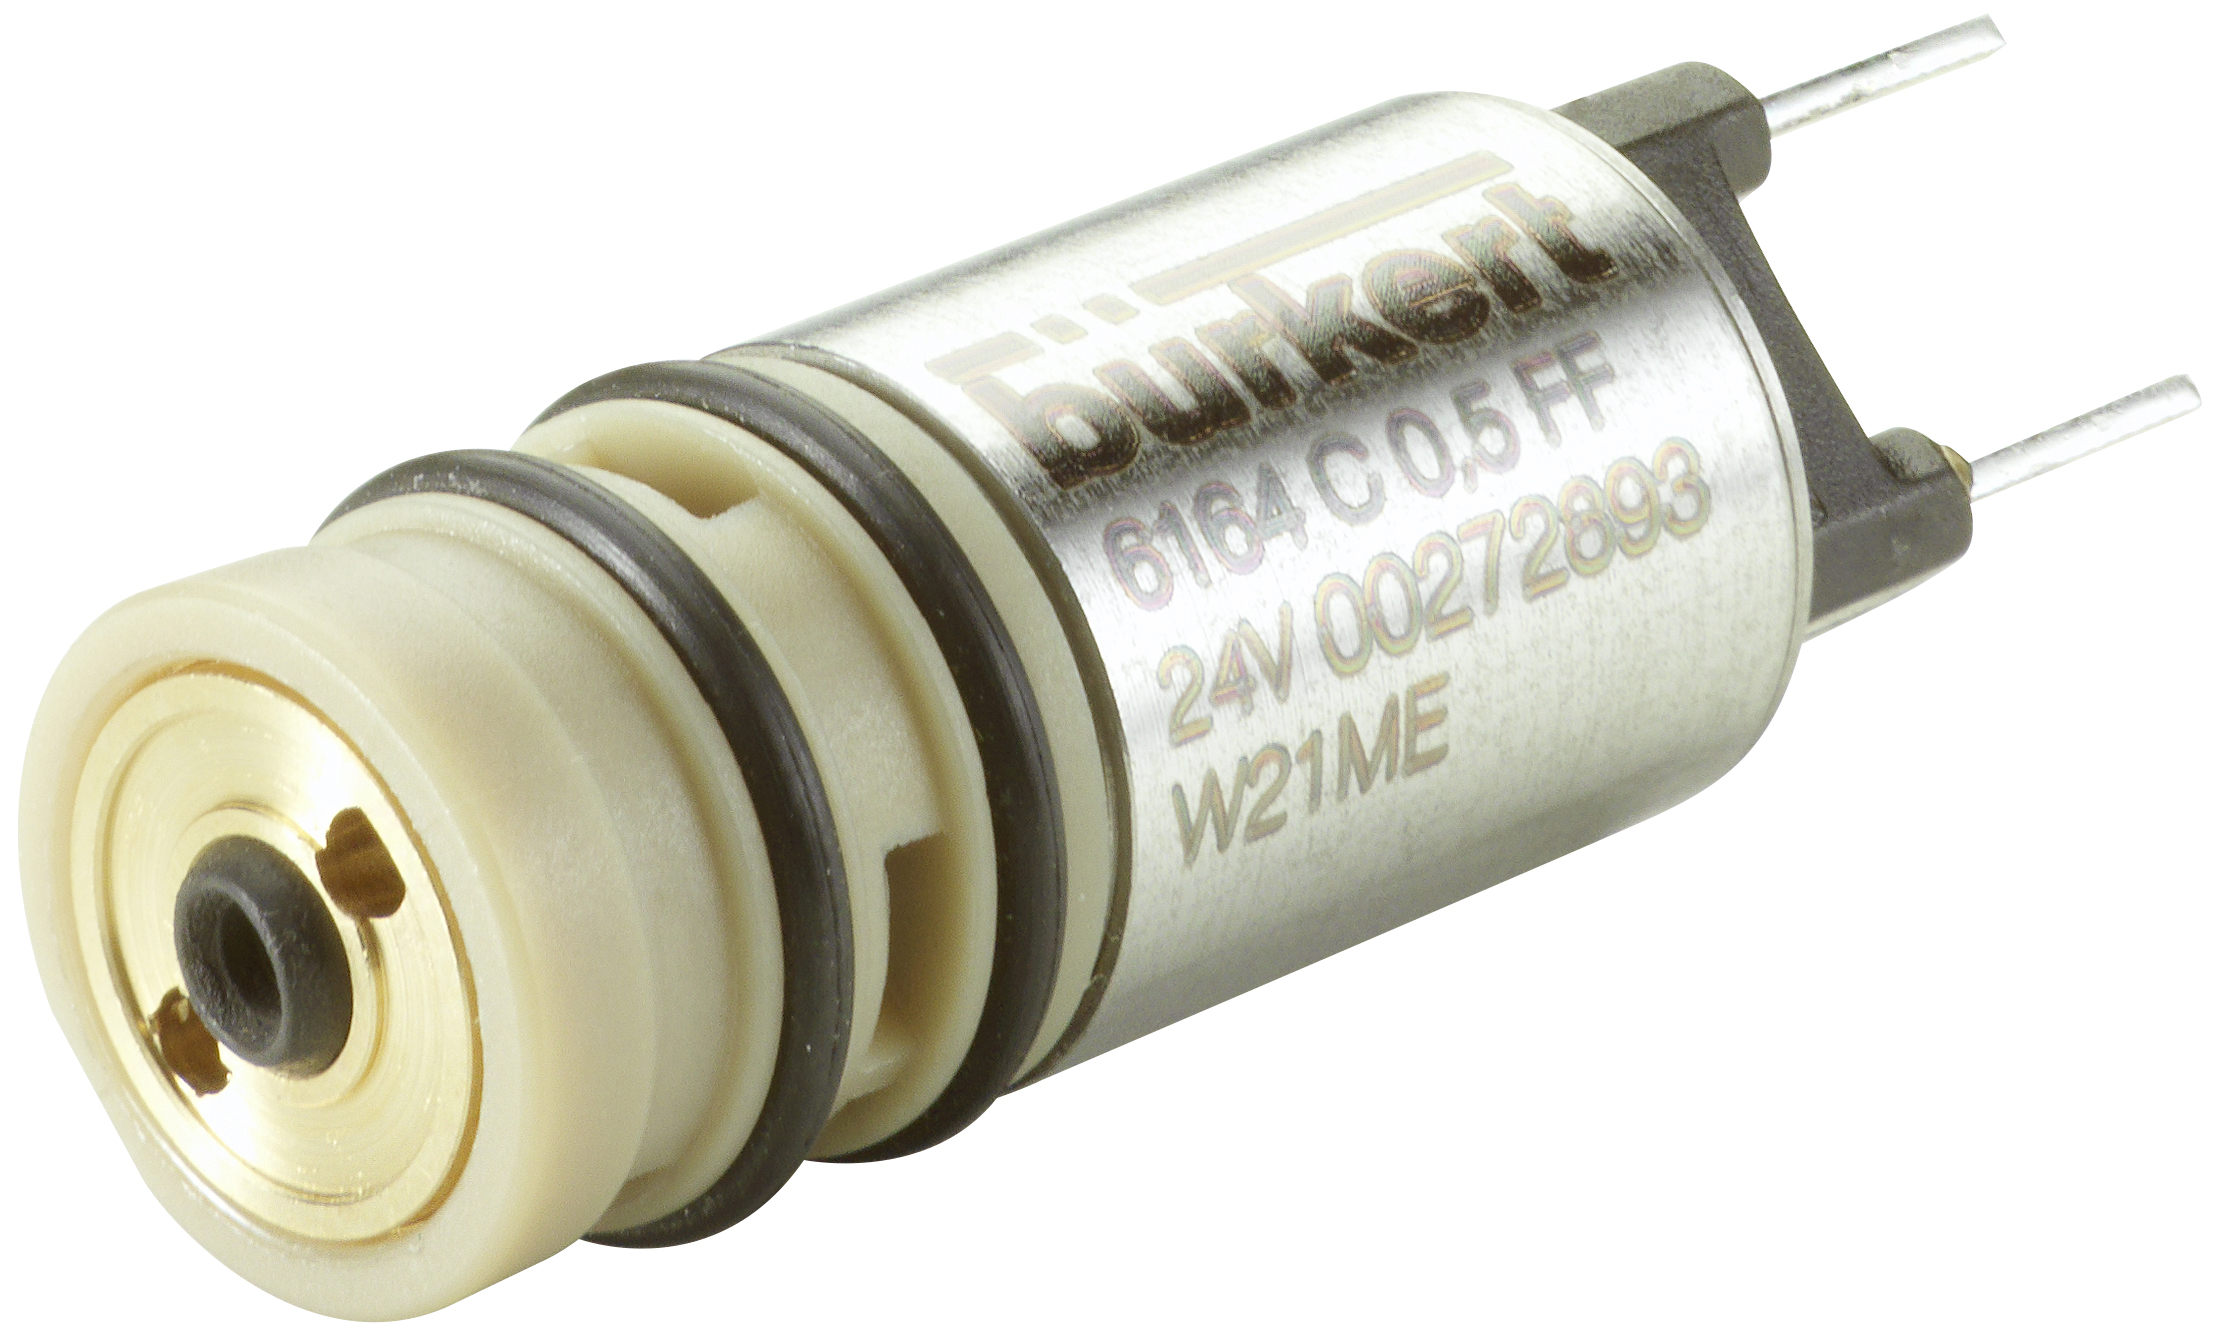 Tipo 6164 - 3/2-way pneumatic cartridge solenoid valve